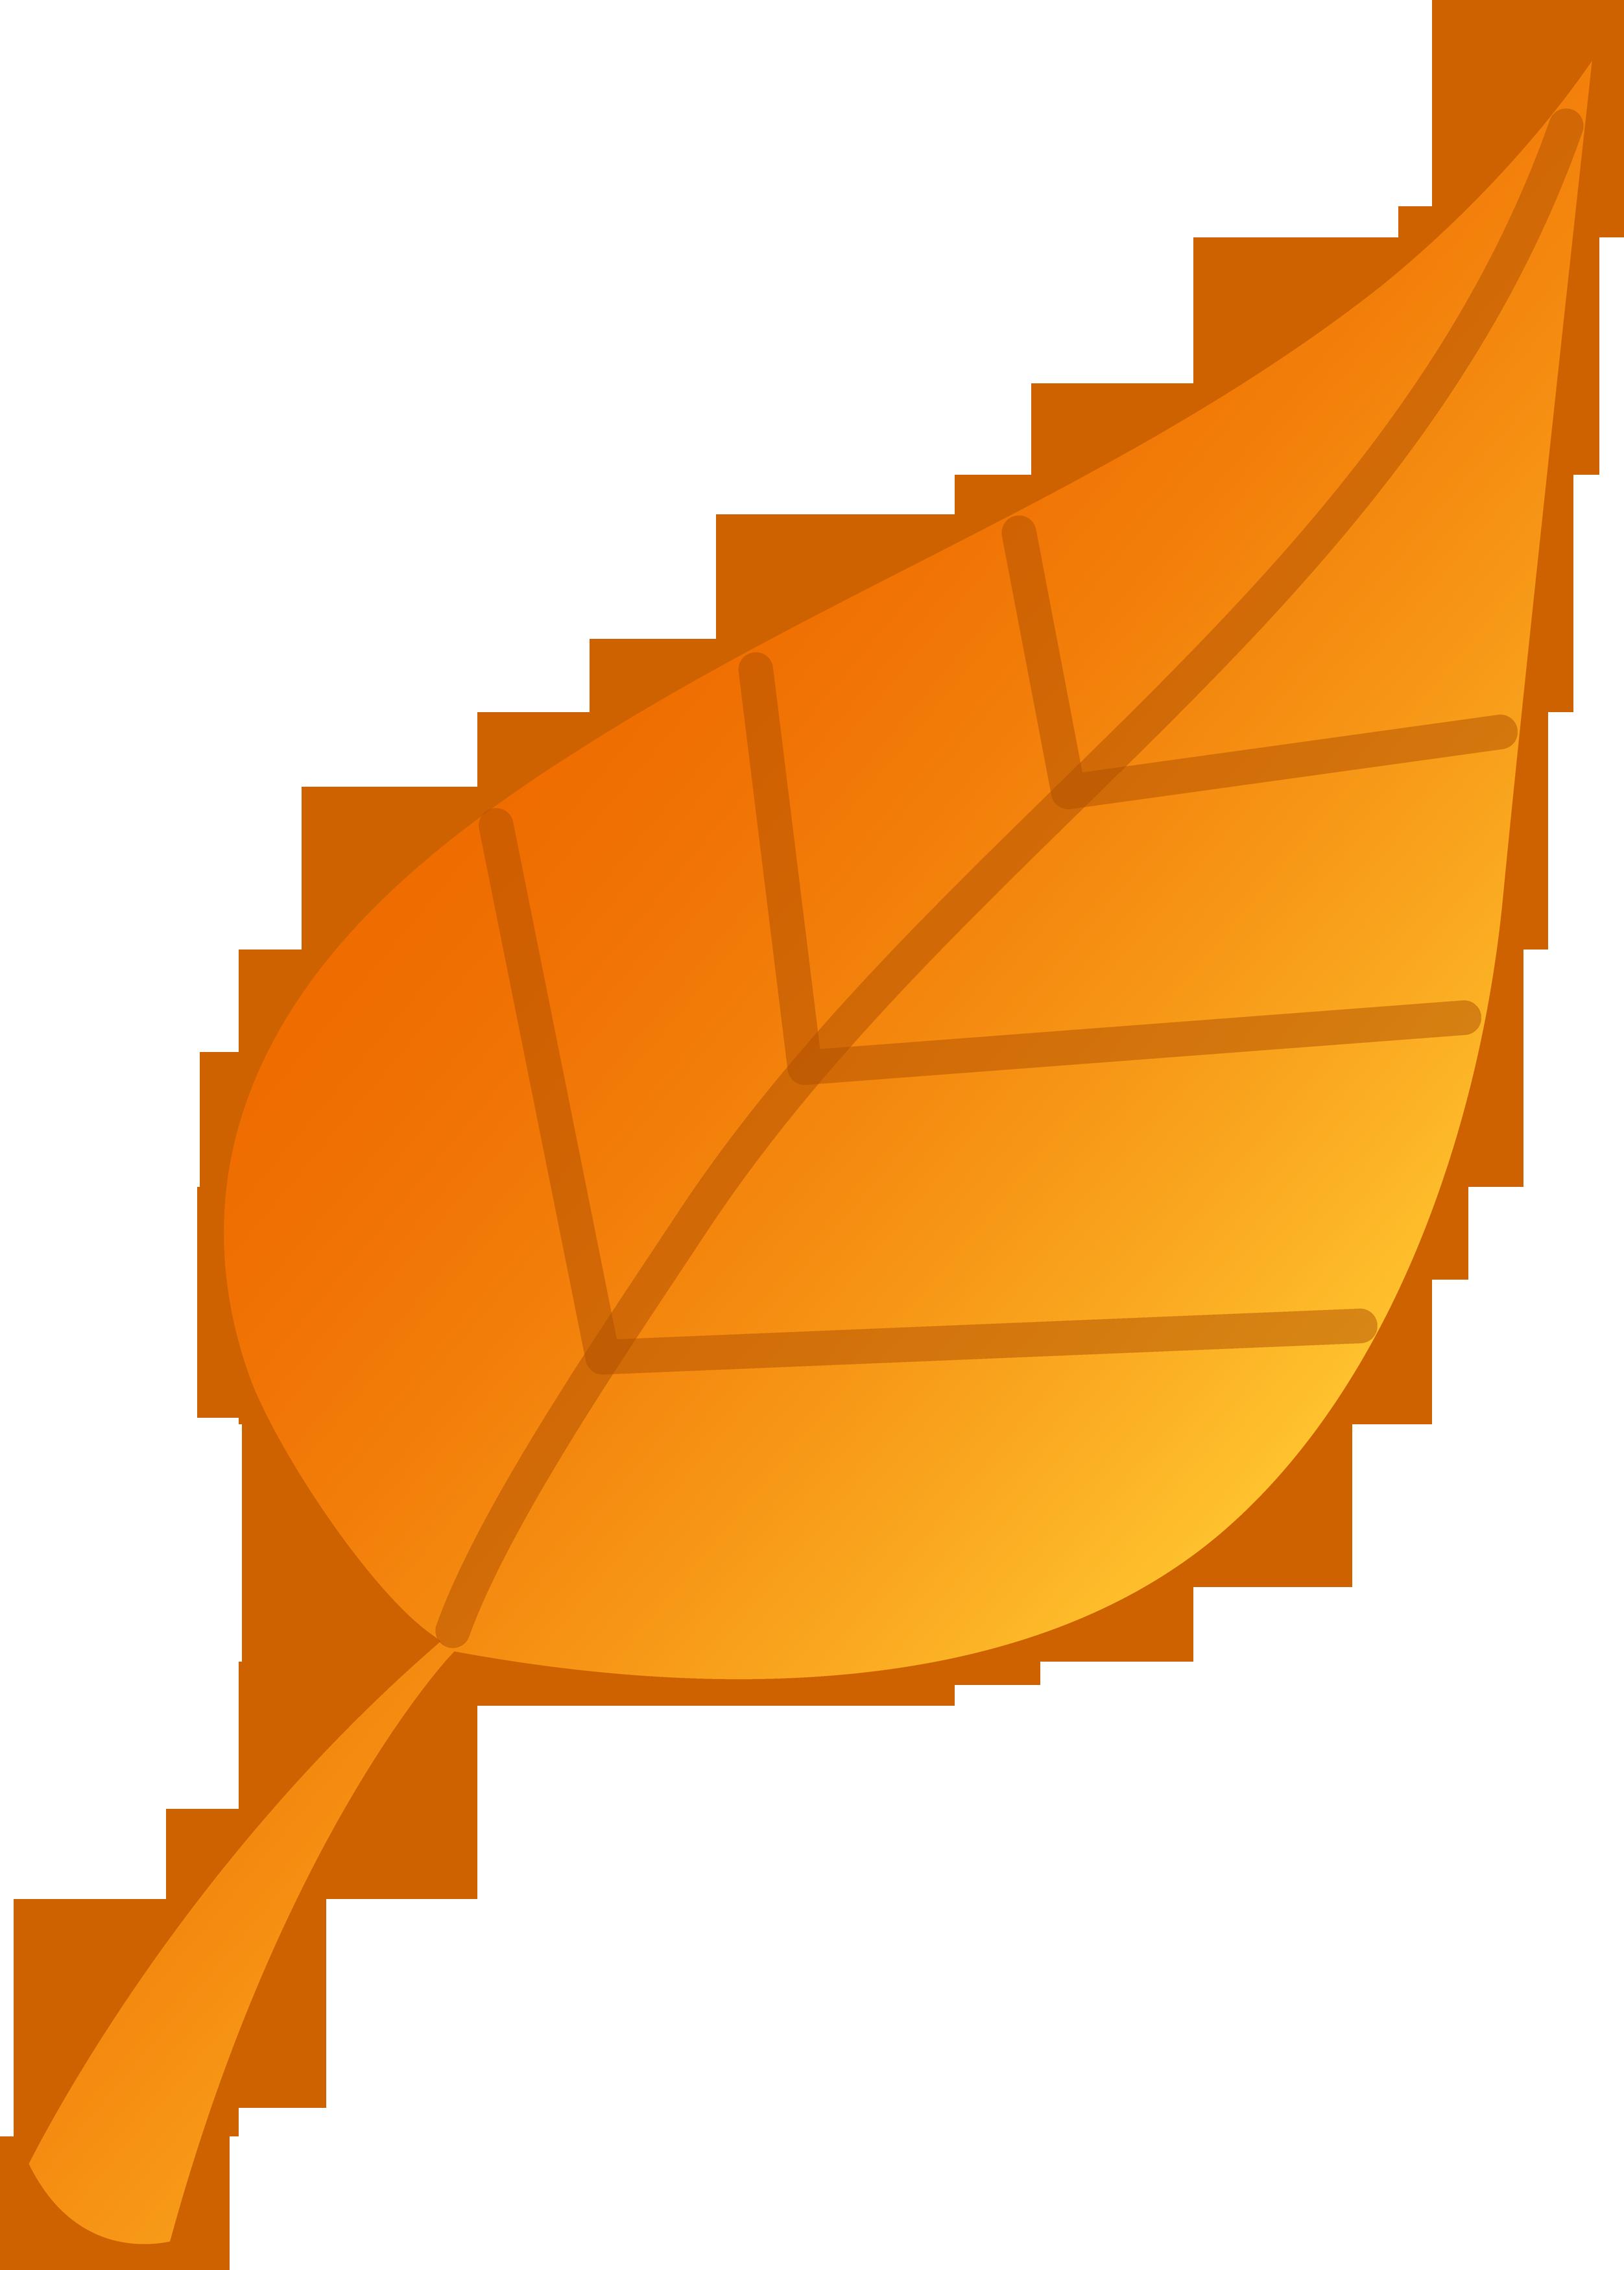 Leaves Autumn Leaf Png Autumn Leaf Png Fans